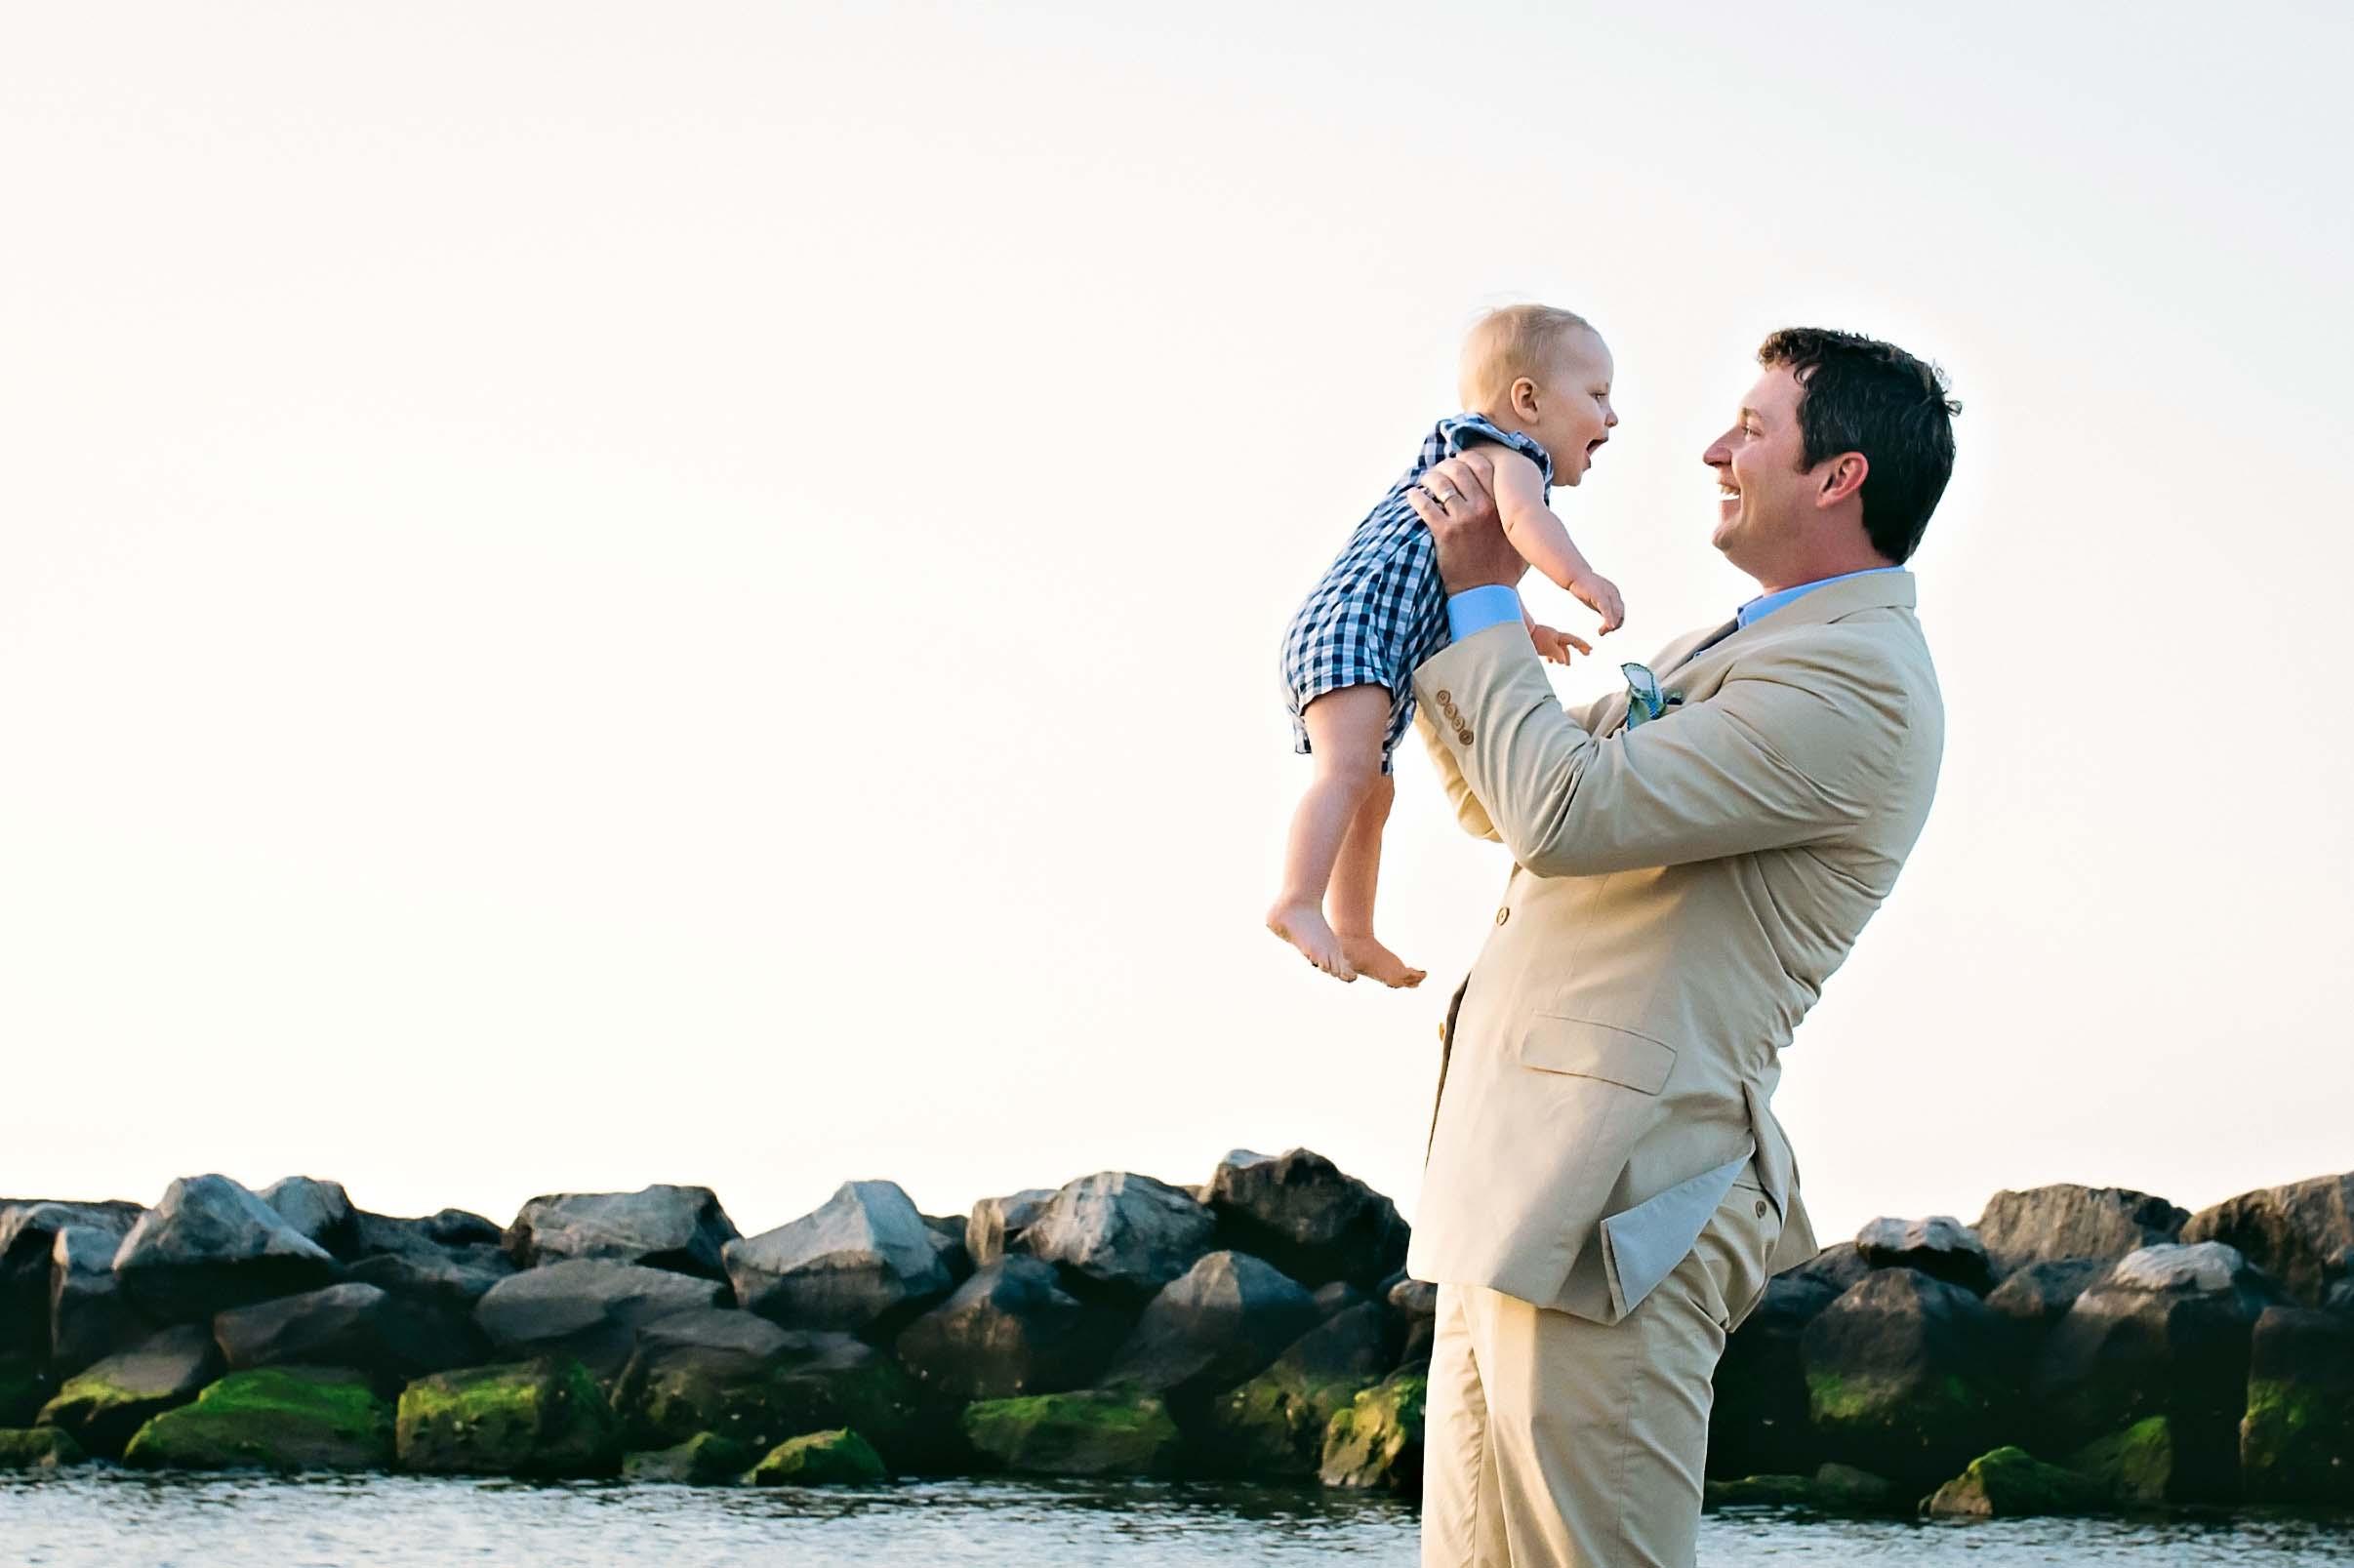 virginia-beach-photographers-melissa-bliss-photography-sandbridge-norfolk-chesapeake-va-beach-family-photographers